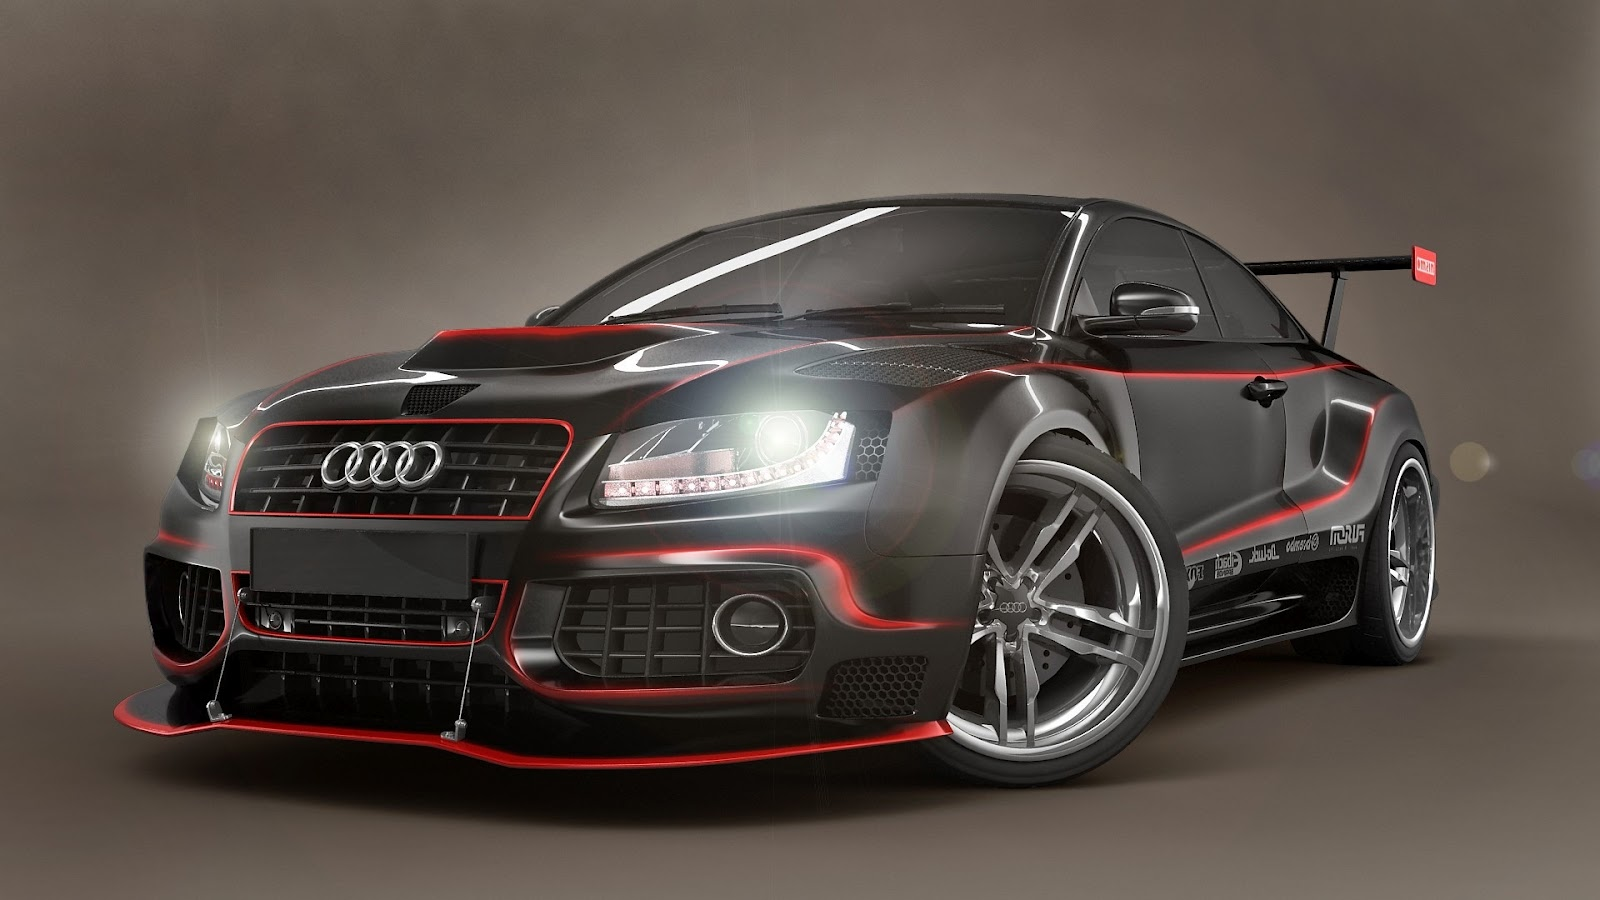 Audi Cars Wallpapers Hd